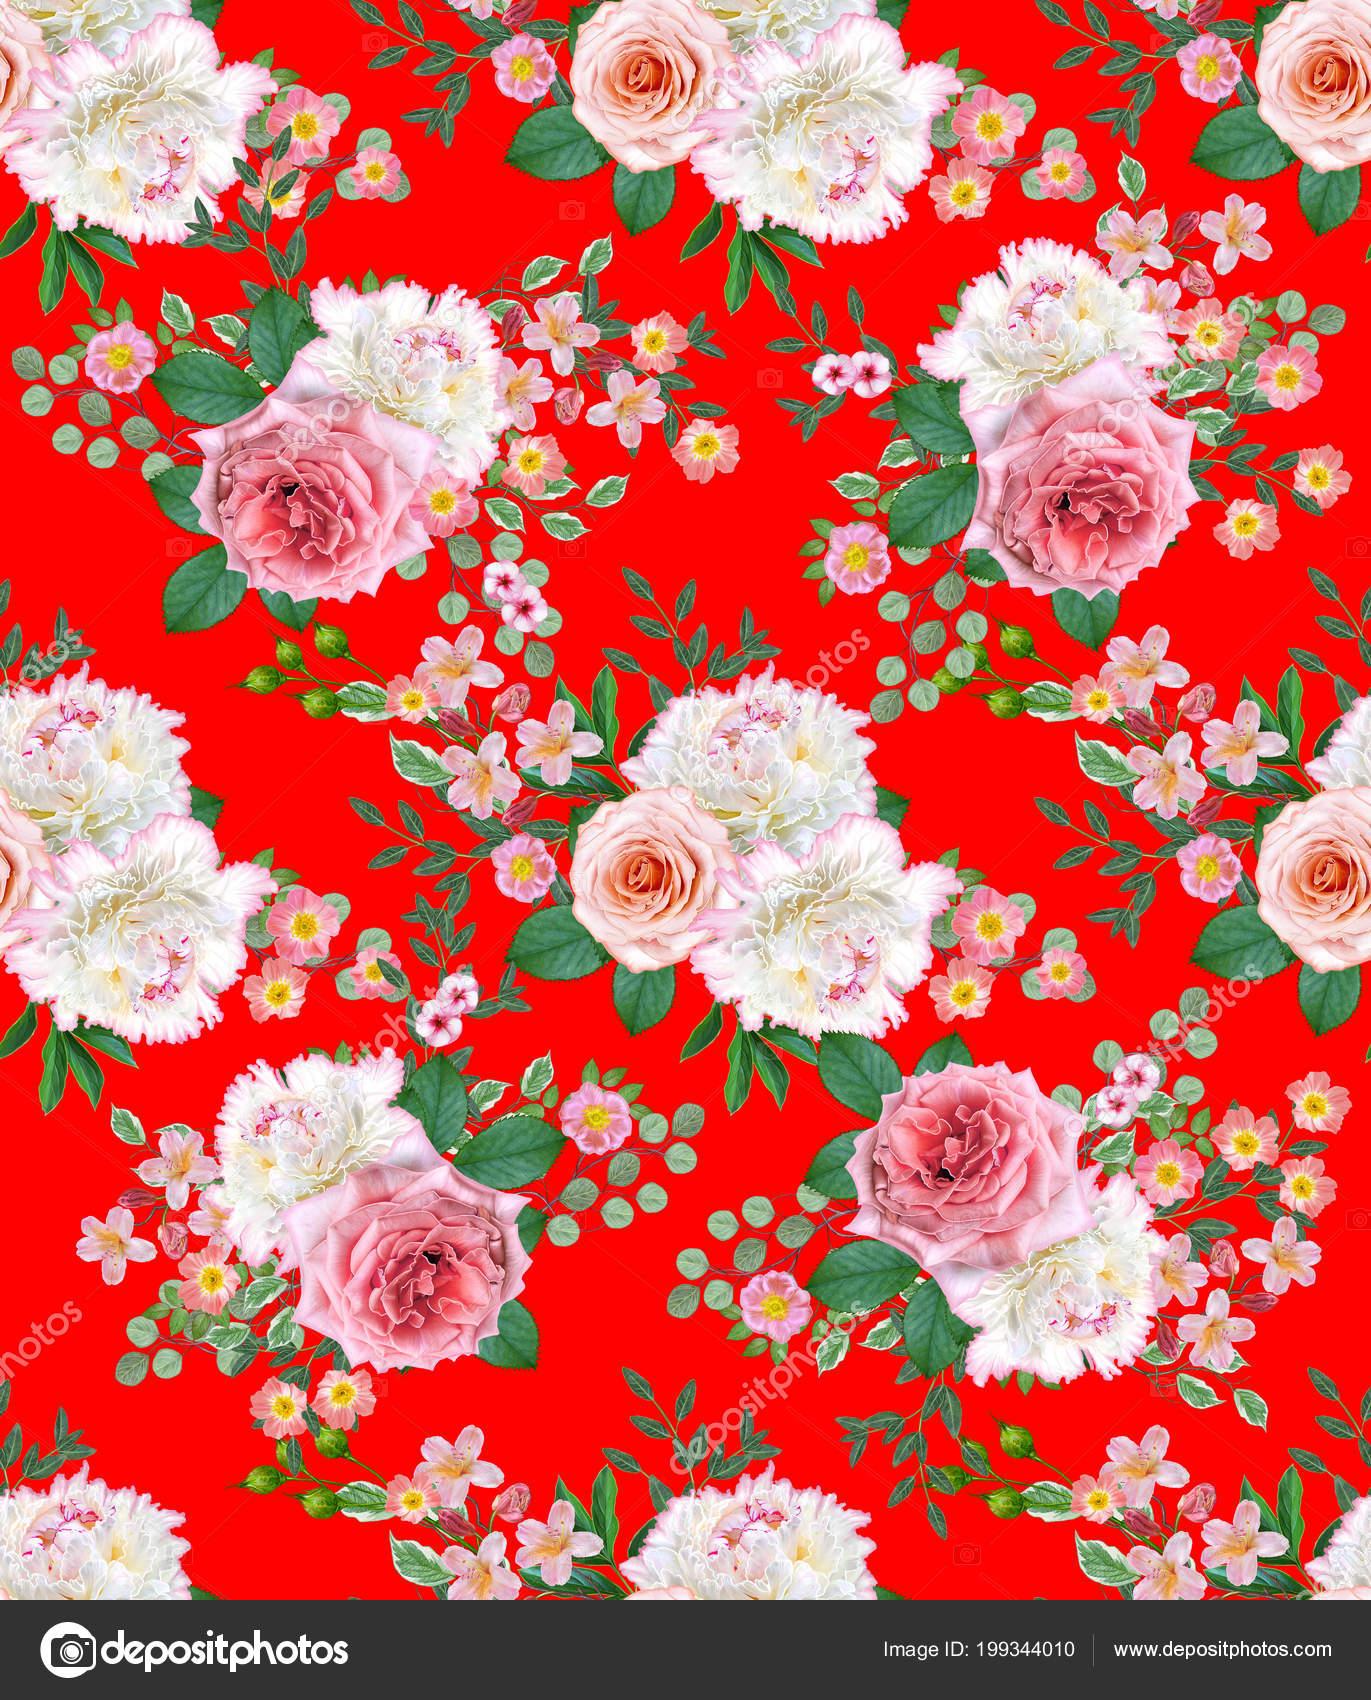 Floral Seamless Pattern Flower Arrangement Bouquet Delicate Beautiful Pink Roses